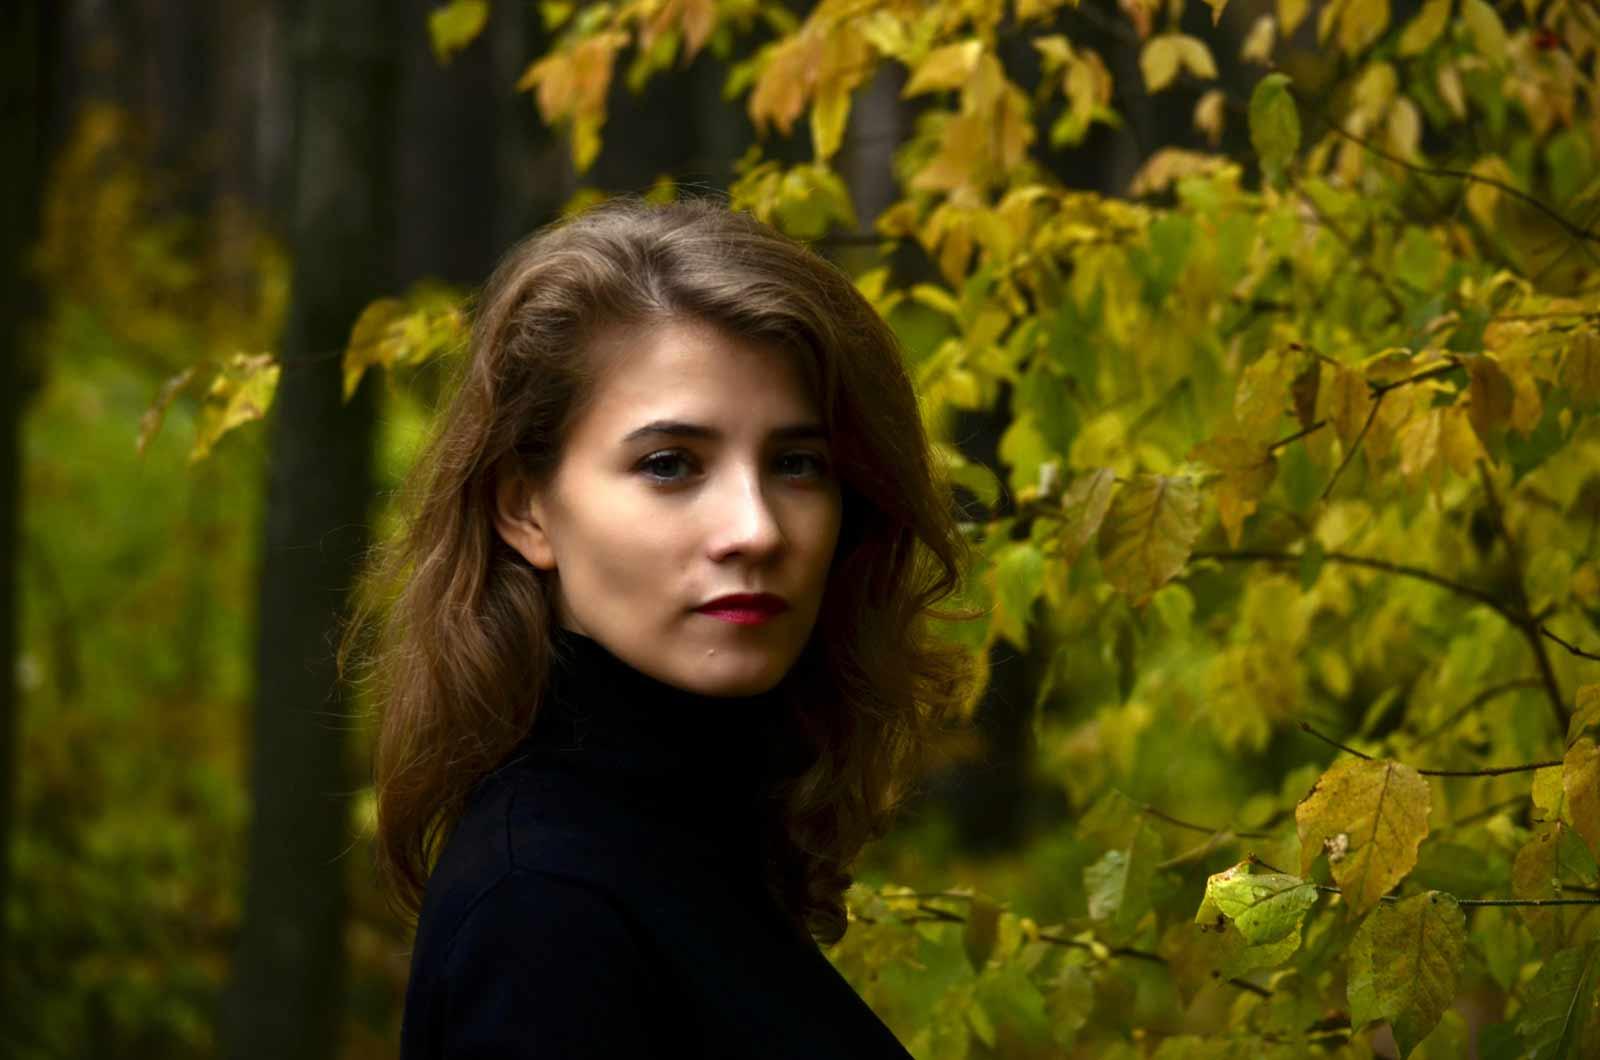 Кузьмичева Ирина, бухгалтер-практик